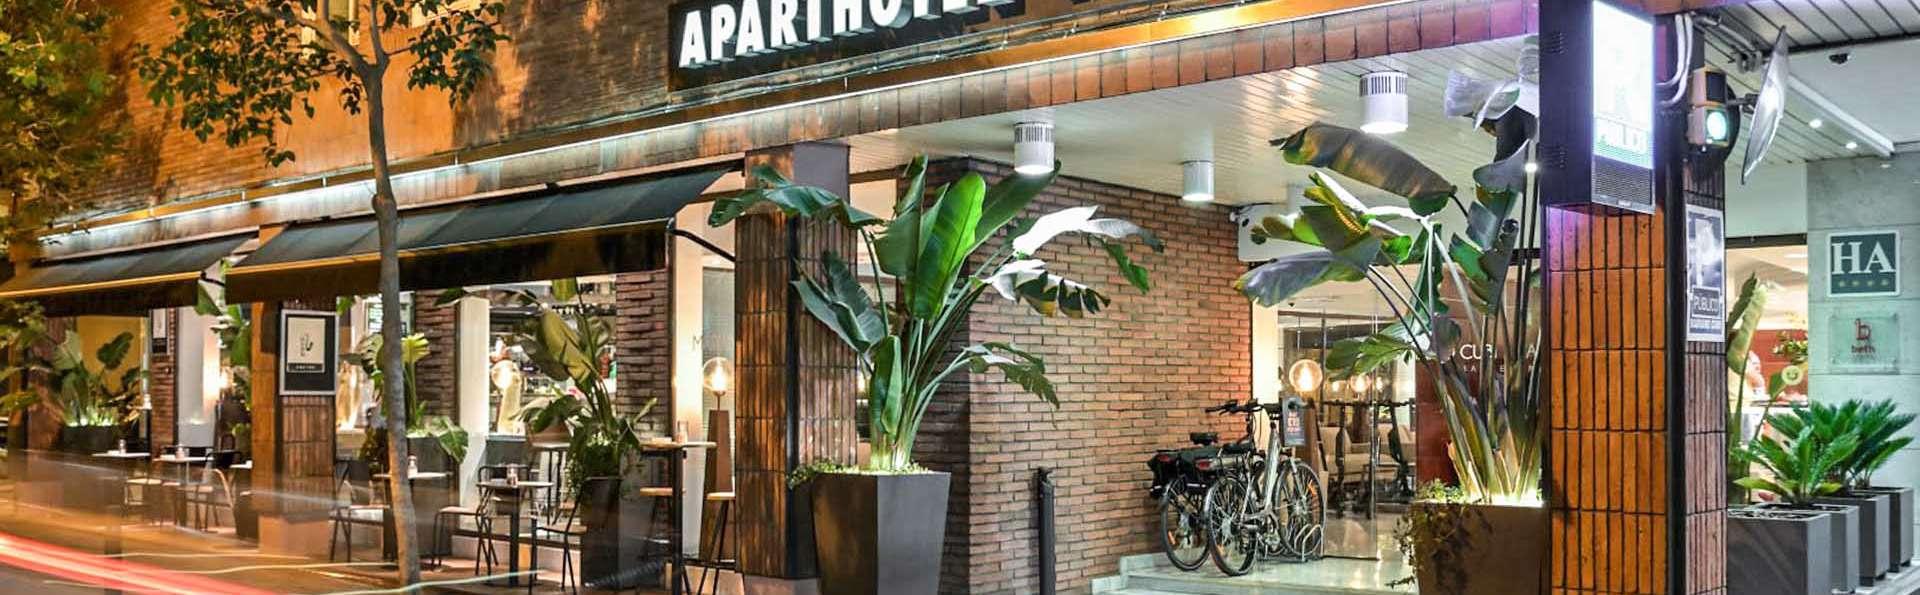 Aparthotel Mariano Cubi Barcelona - EDIT_cactus-_Grande__04.jpg